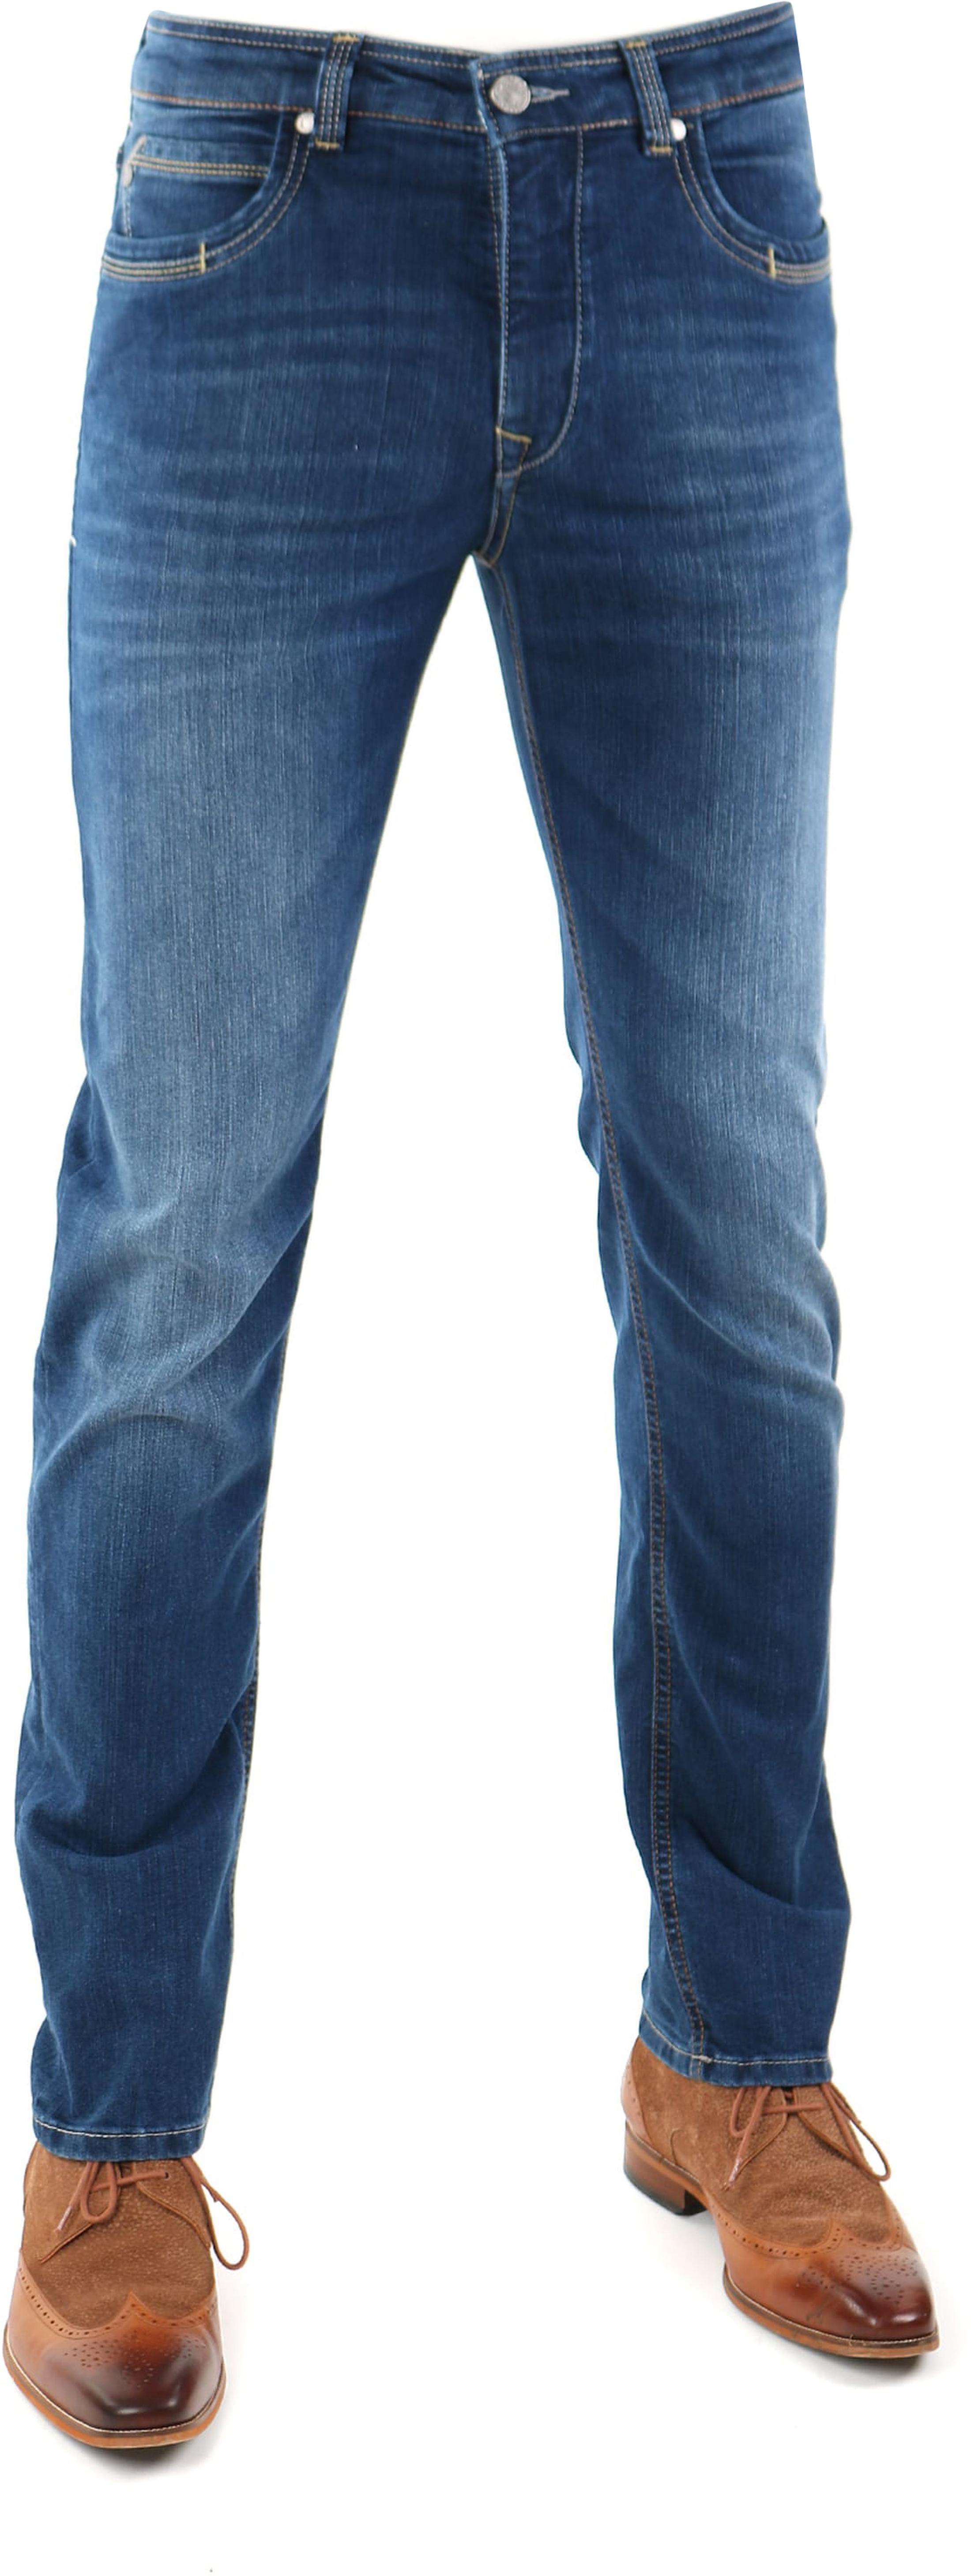 Gardeur Batu Jeans Modern-Fit Blau foto 0